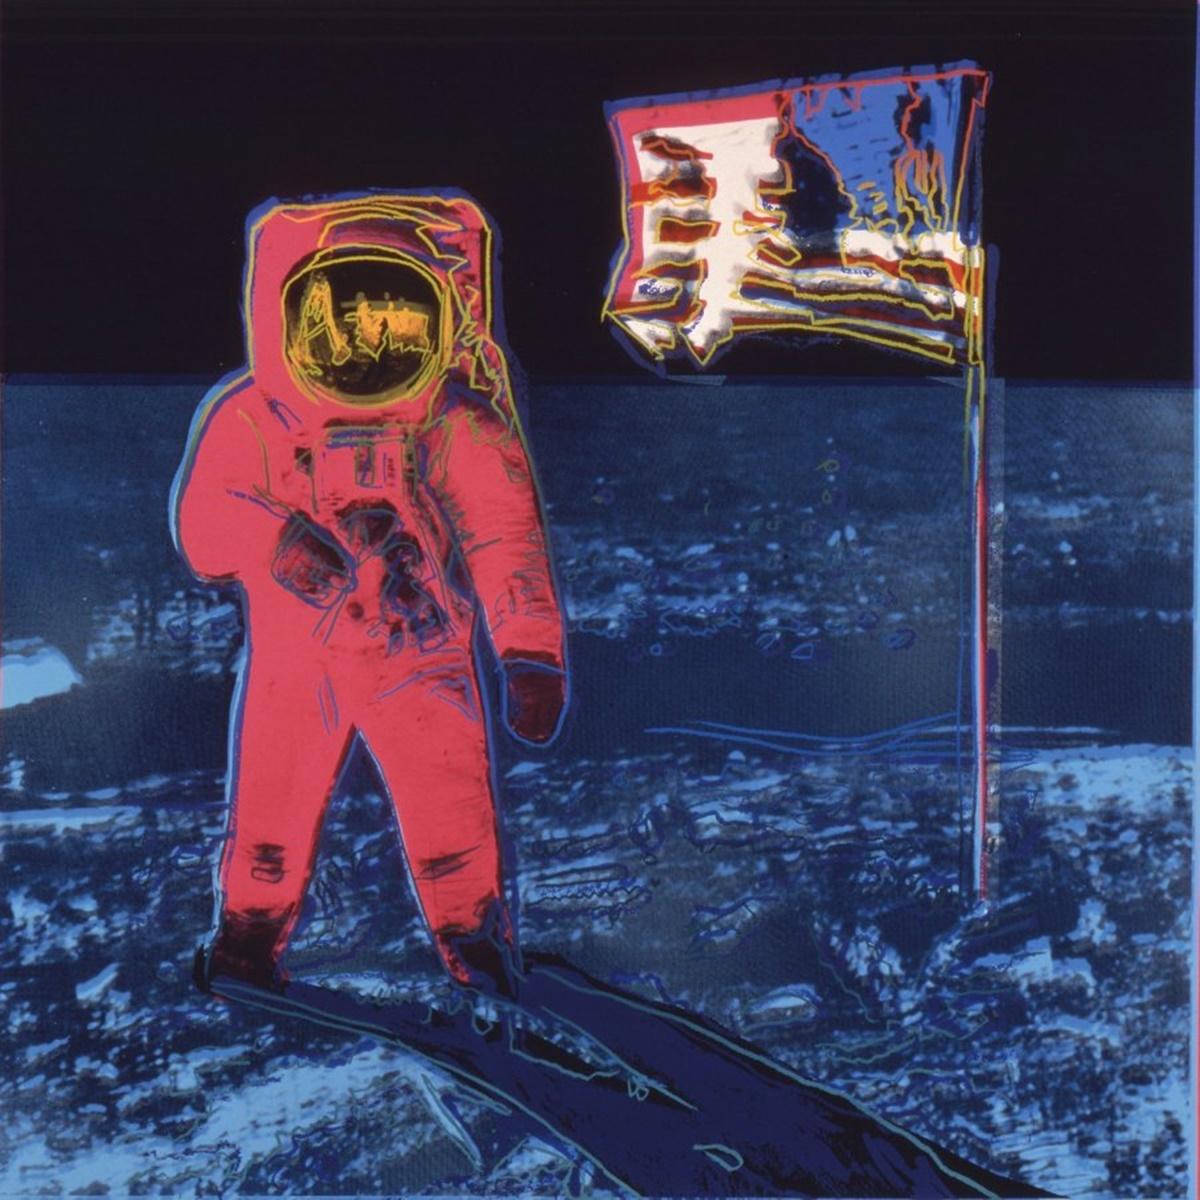 Andy Warhol, Moonwalk, 1987